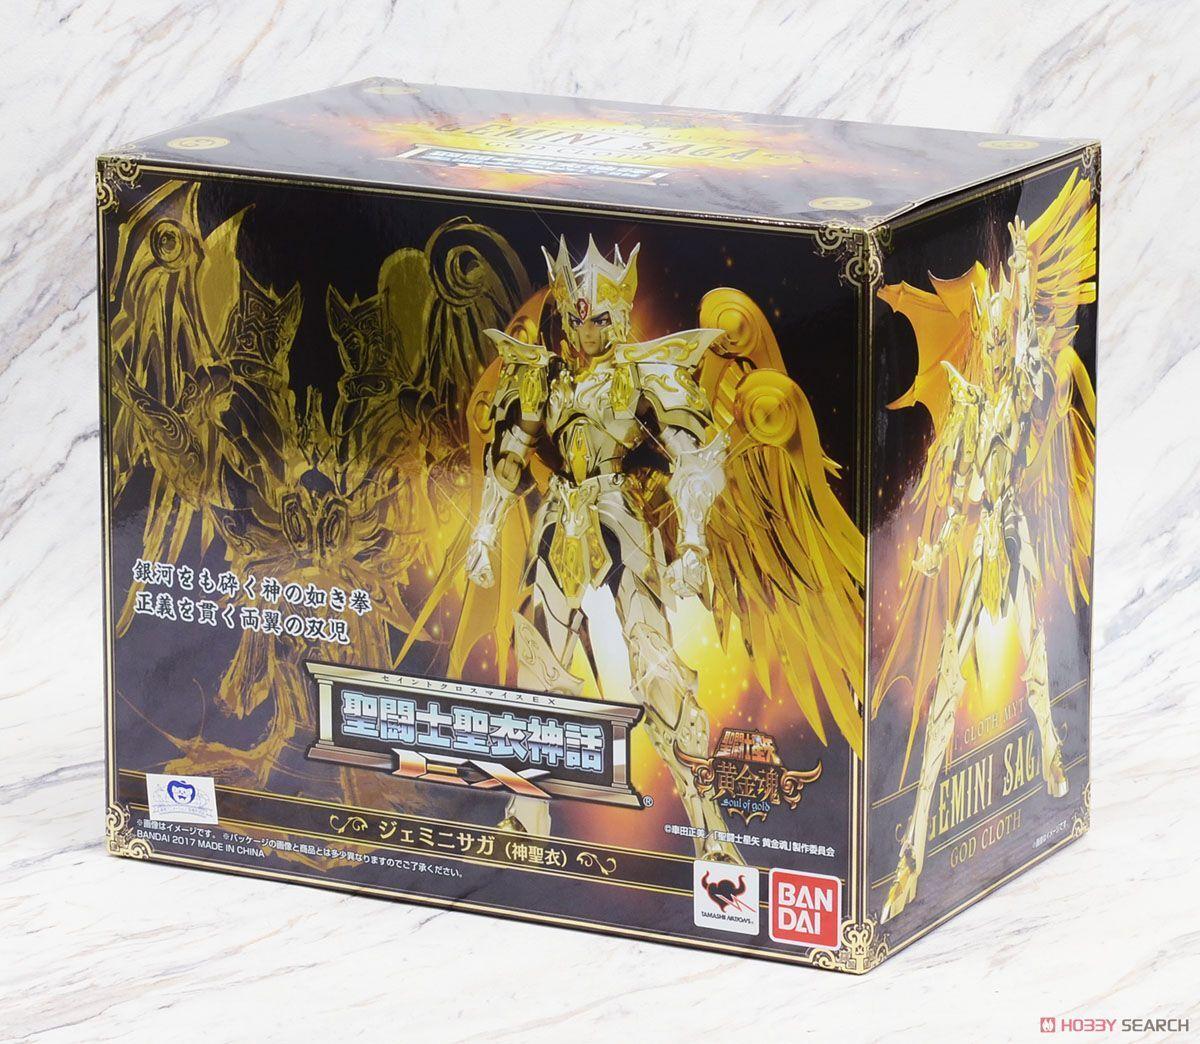 Saint Seiya ab Gemini Gemini Gemini Saga Soul Of Gold God Cloth Ritter die Tierkreis Bandai b144cb